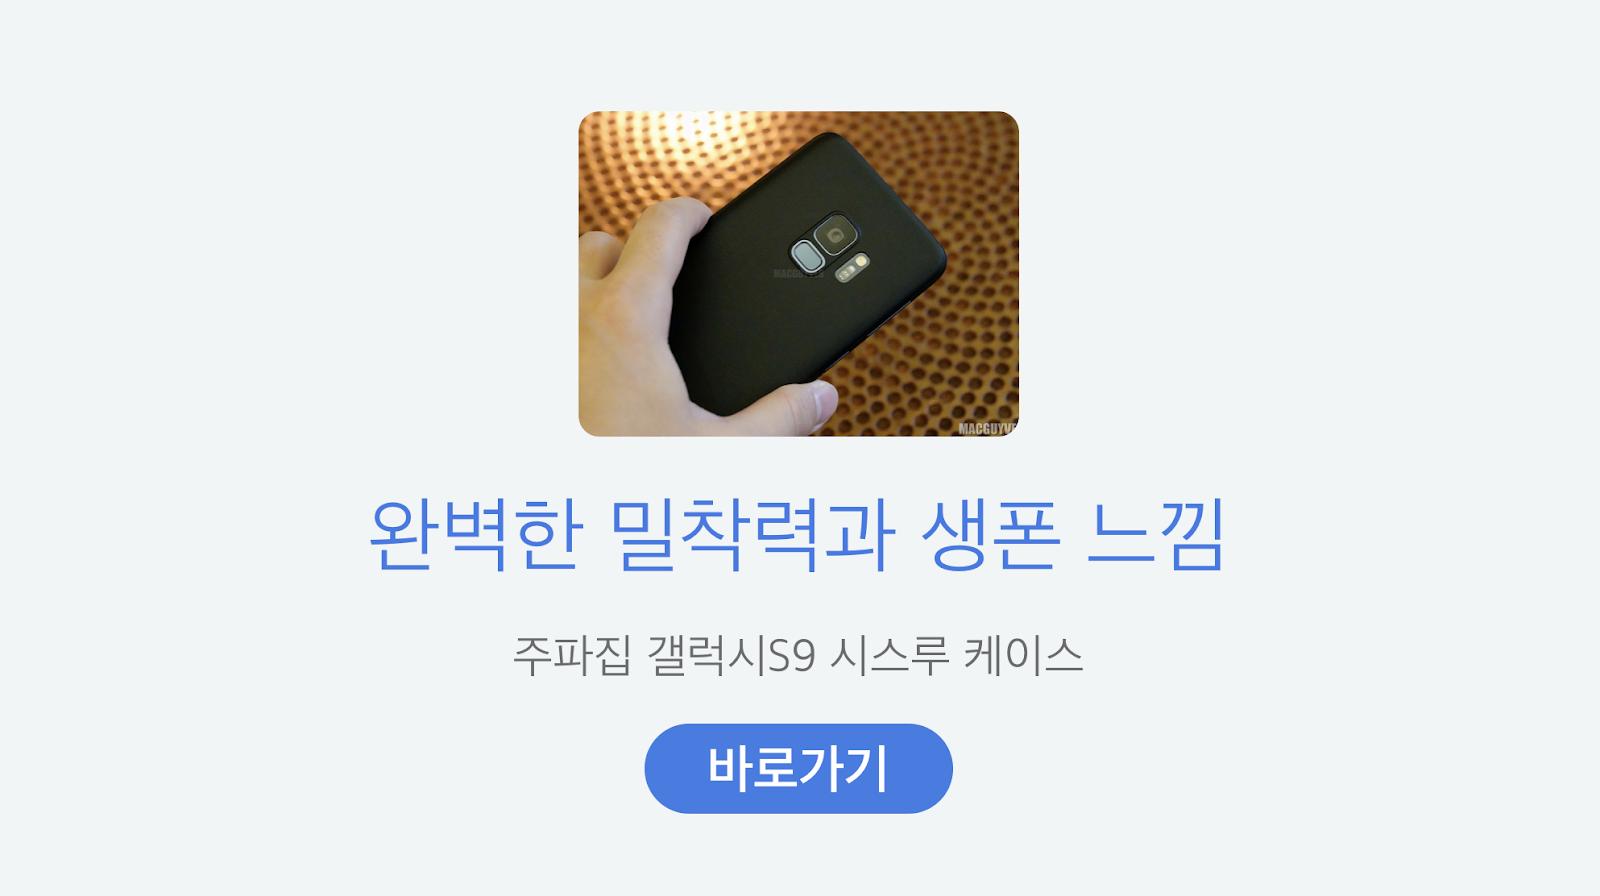 http://smartstore.naver.com/jupazip/products/2600112141